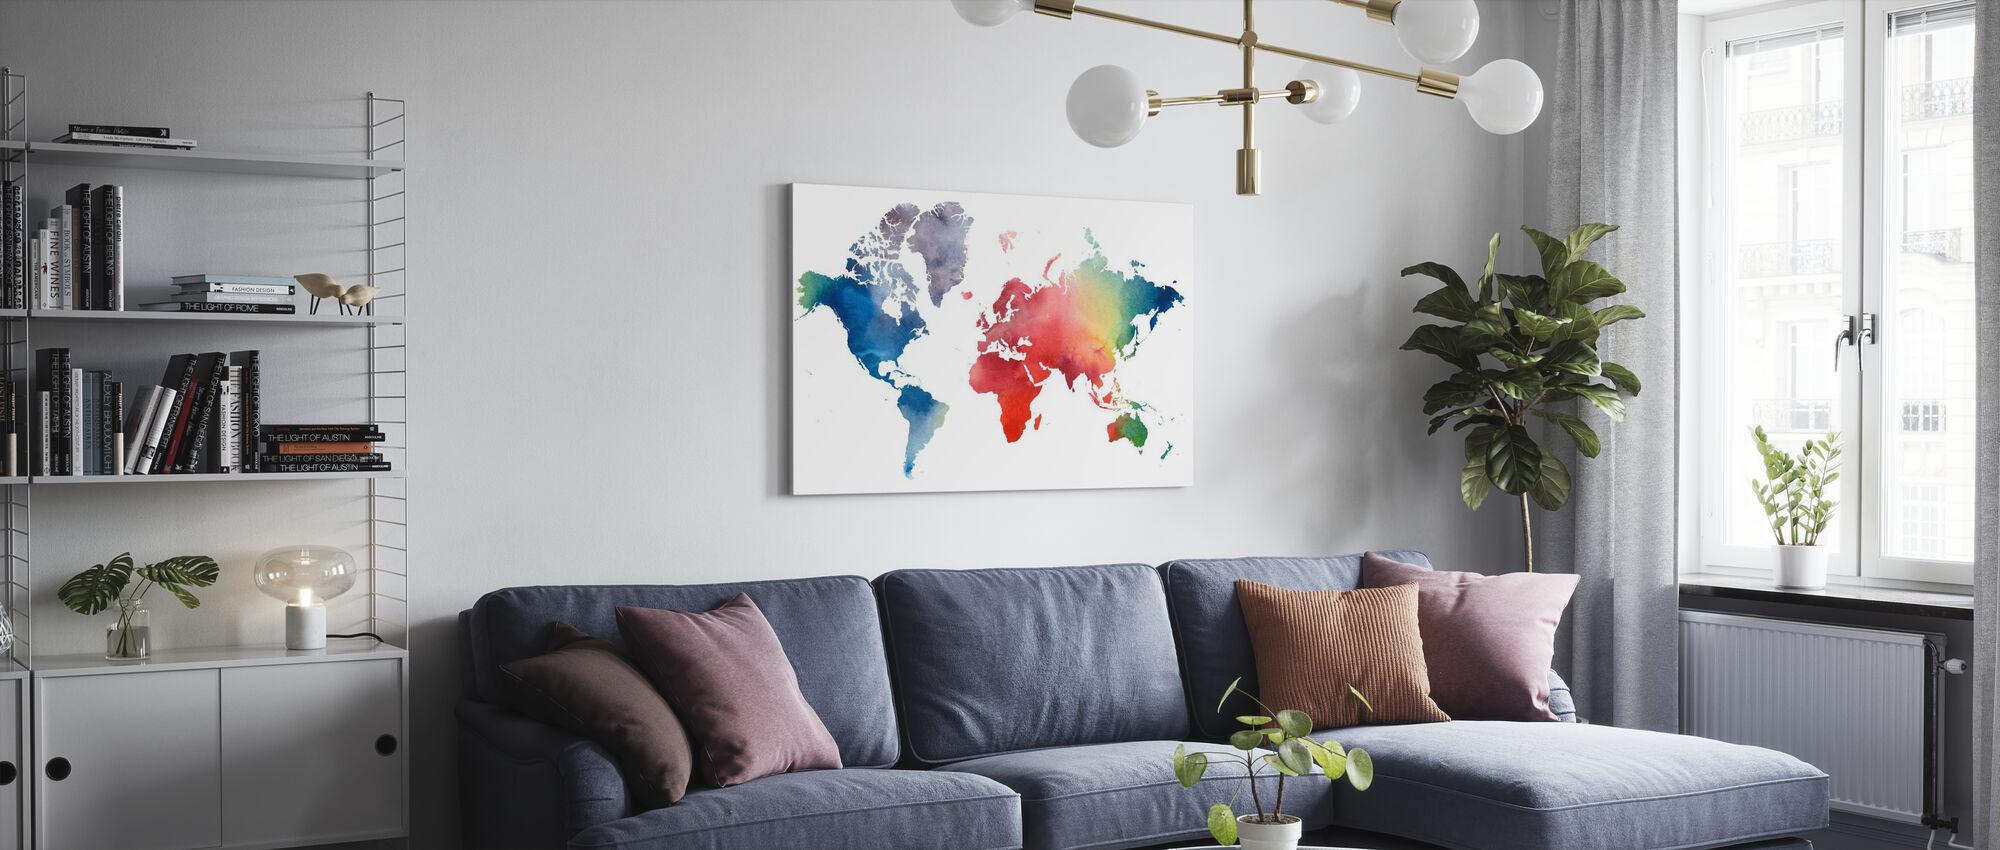 Regenboog Wereld - Canvas print - Woonkamer